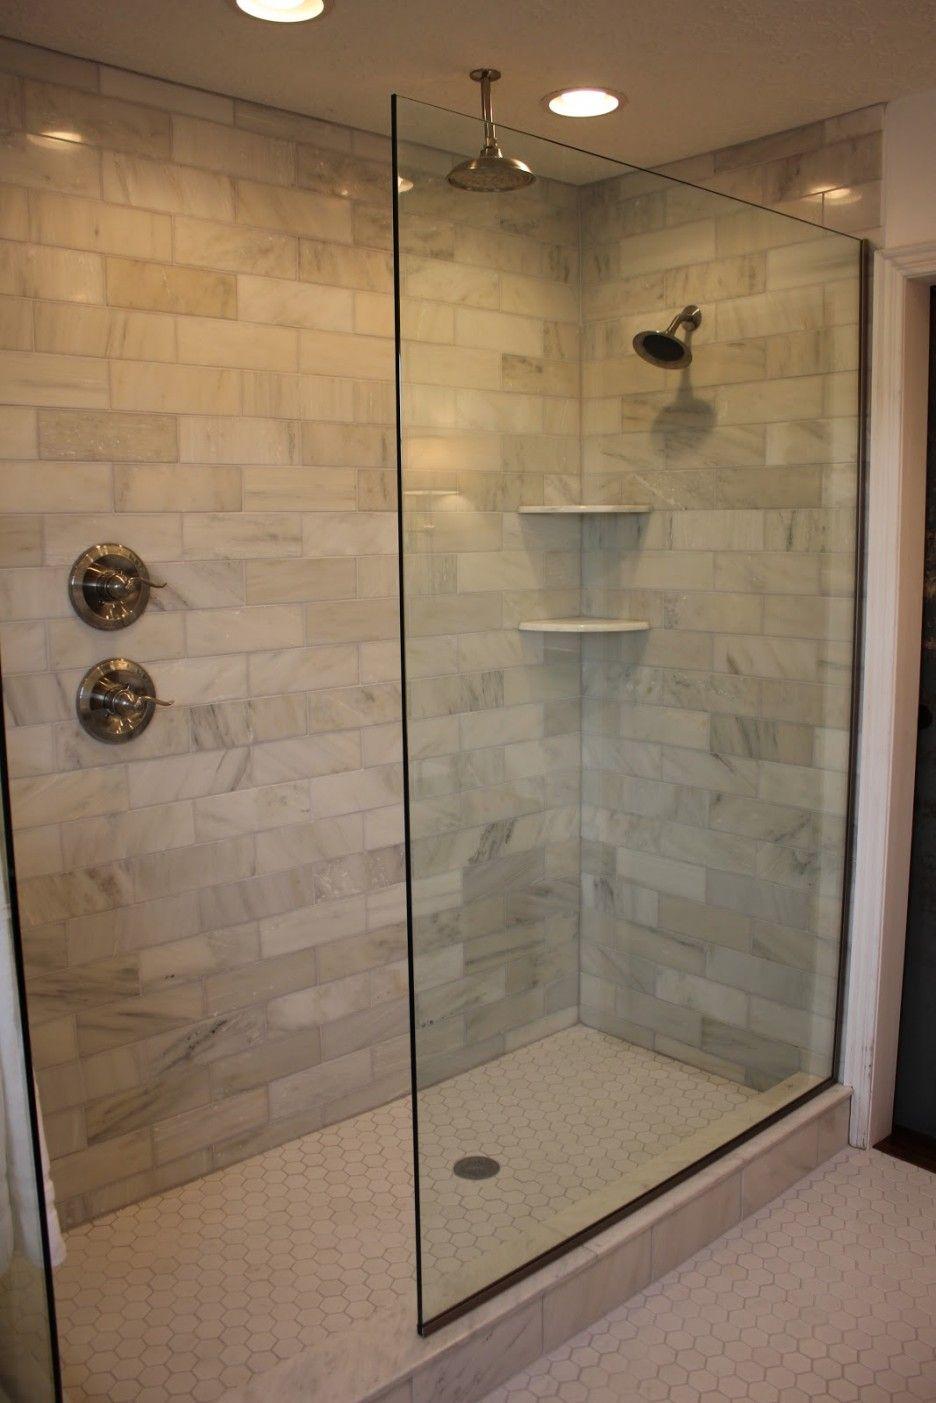 Doorless Walk In Shower Designs. shower handle on separate